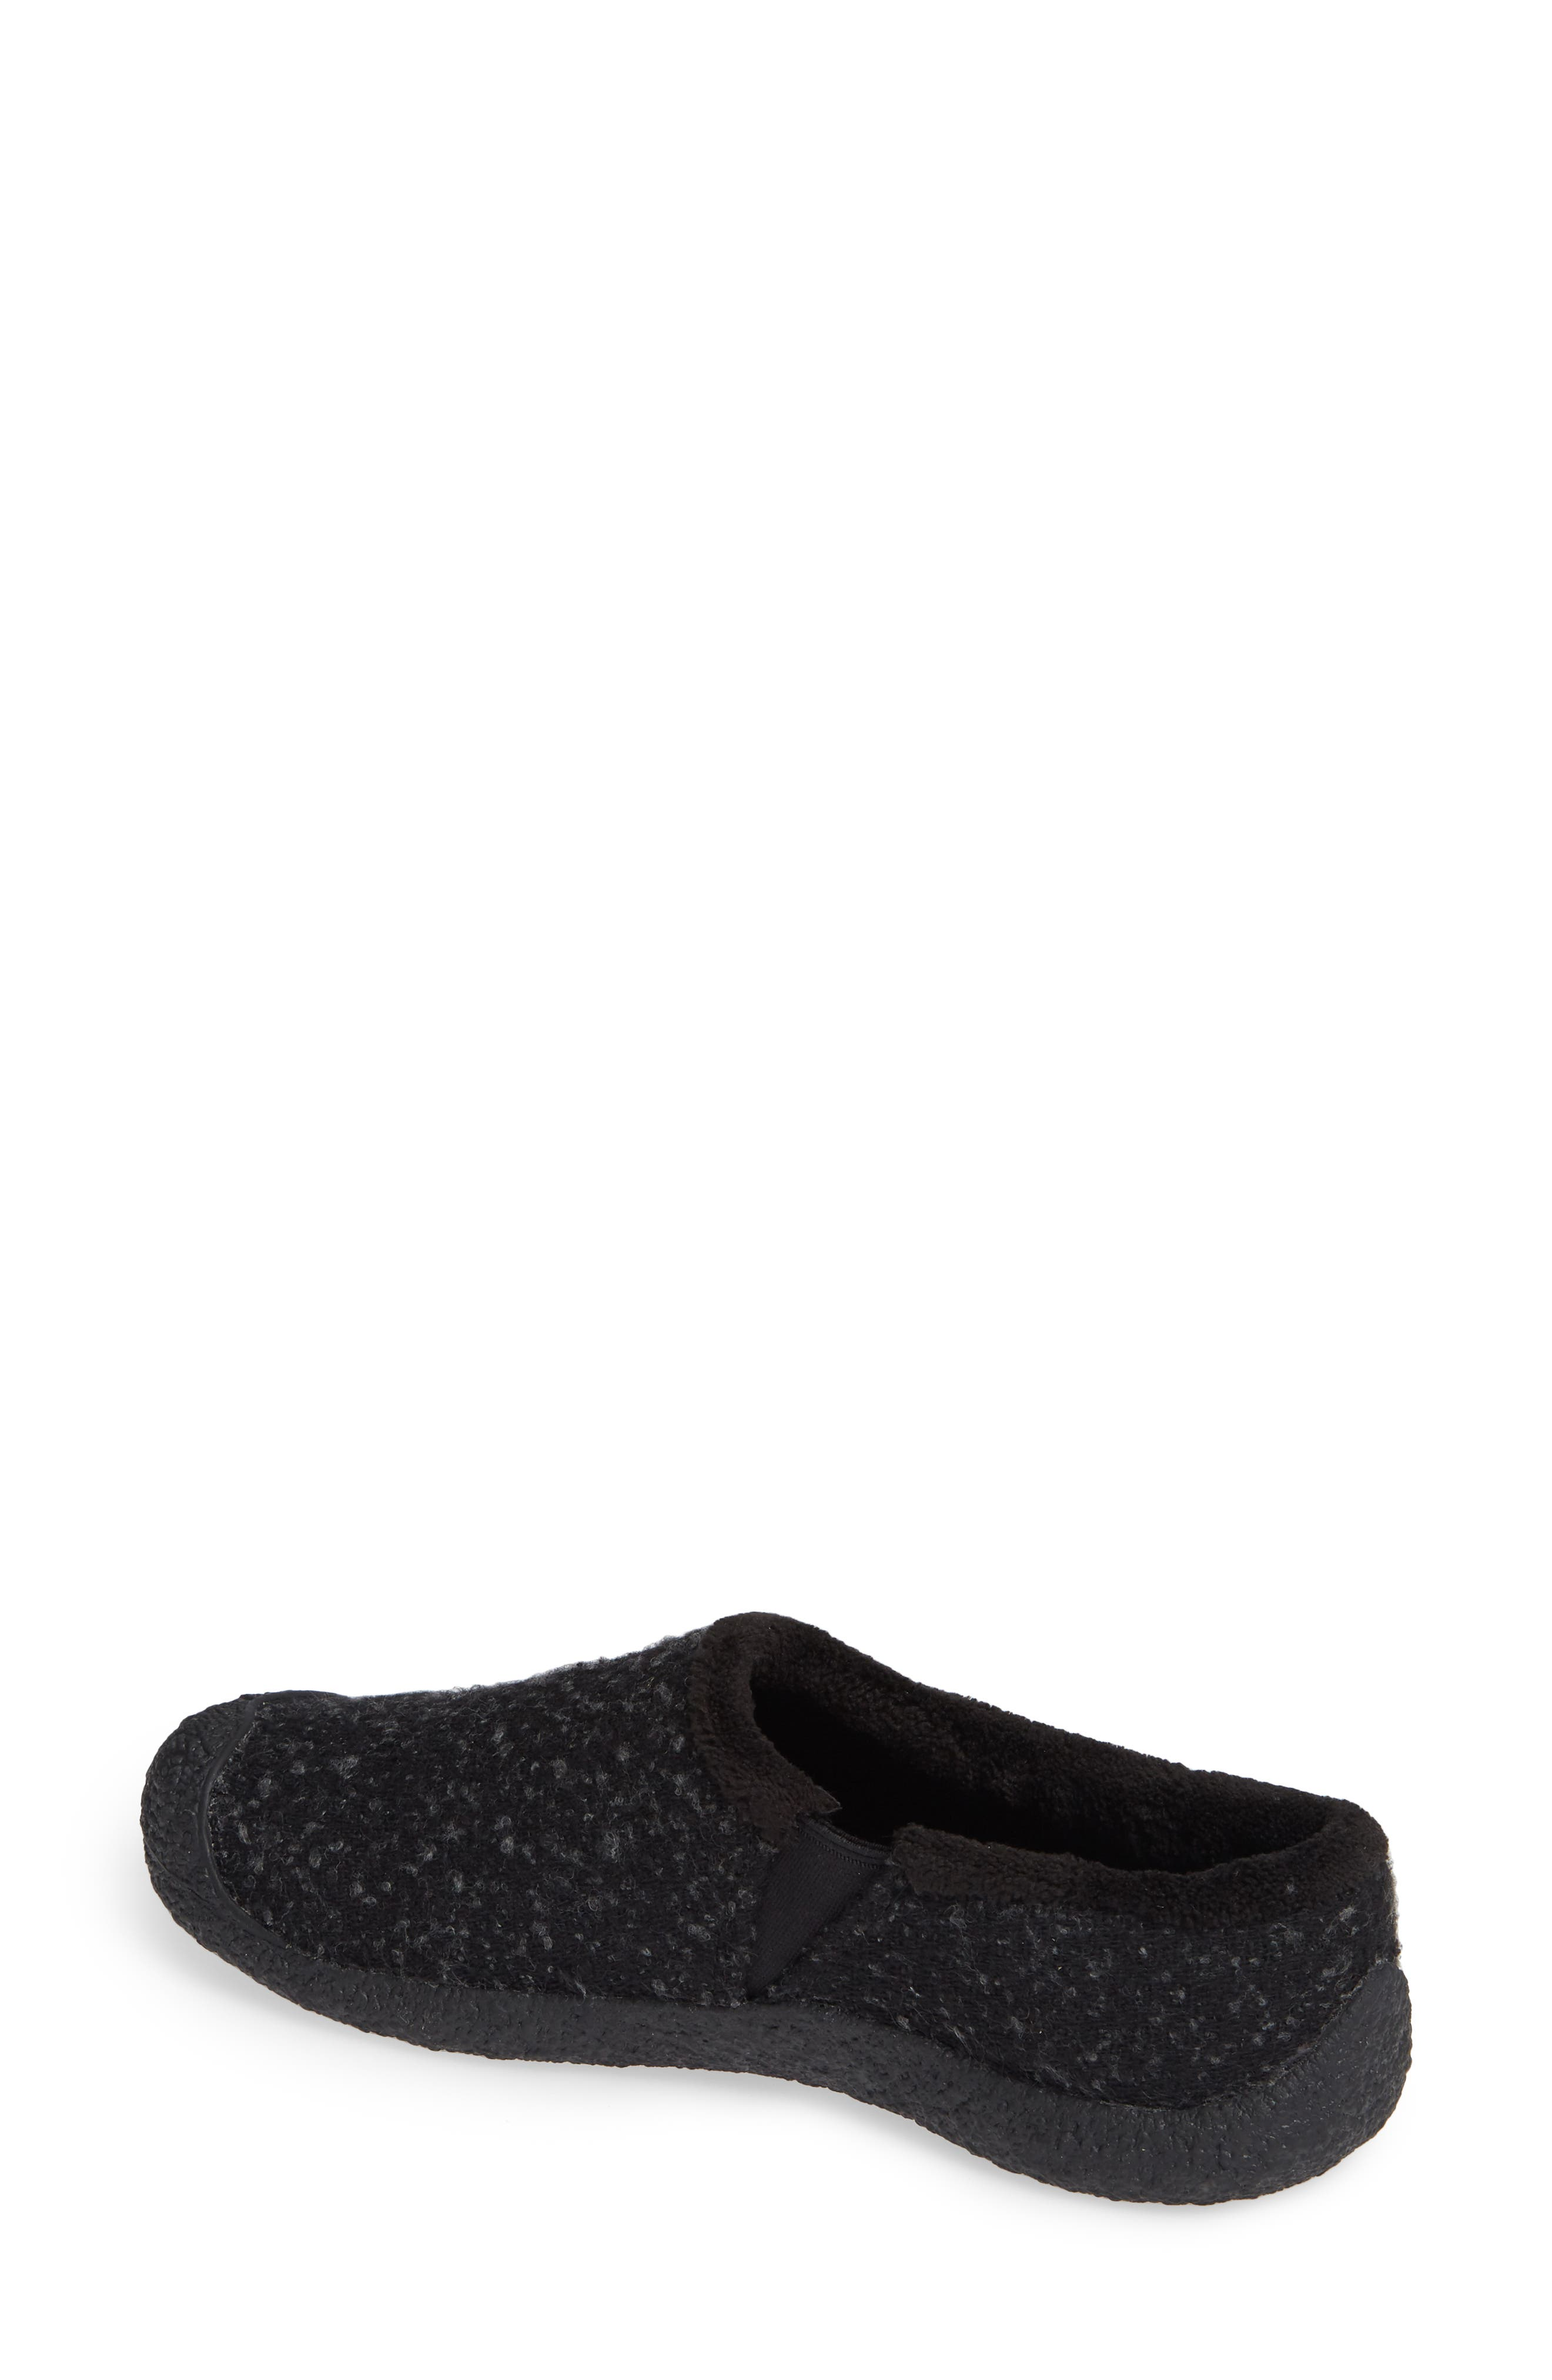 Howser Round Toe Wool Slip-on,                             Alternate thumbnail 2, color,                             BLACK KNOBBY/ STEEL GREY WOOL